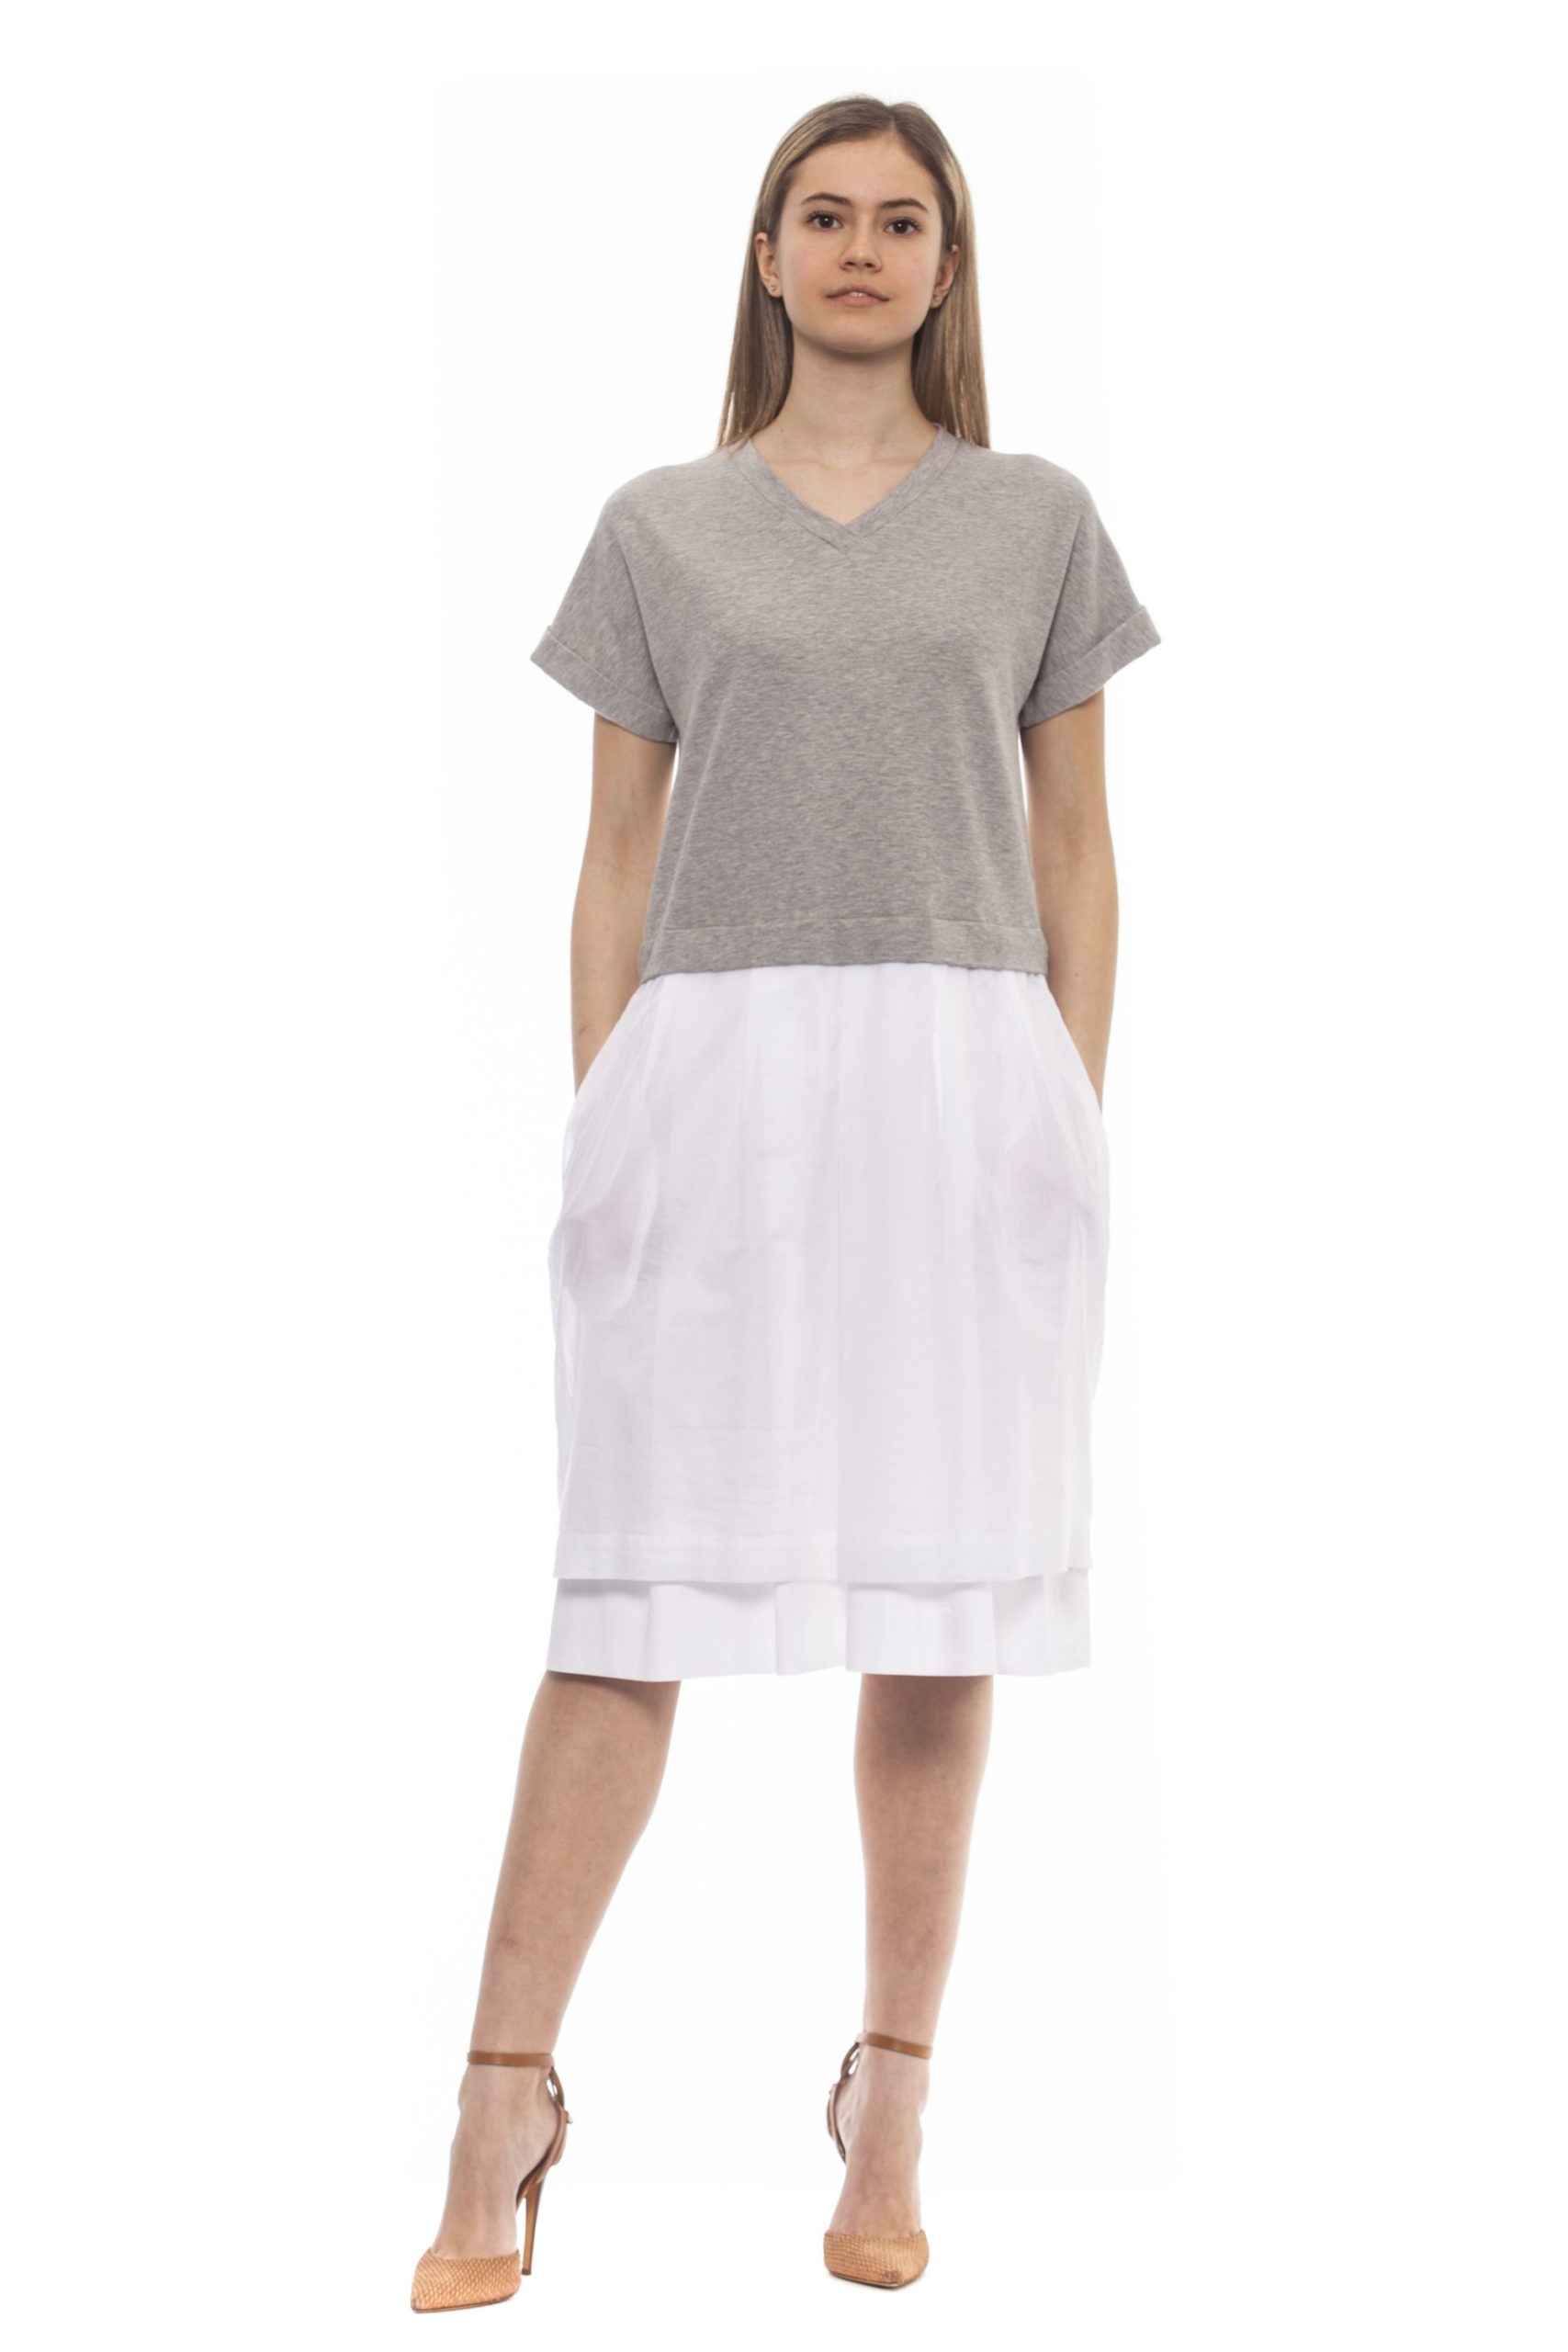 Peserico Women's Grigio Dress Gray PE1383206 - IT42 | S